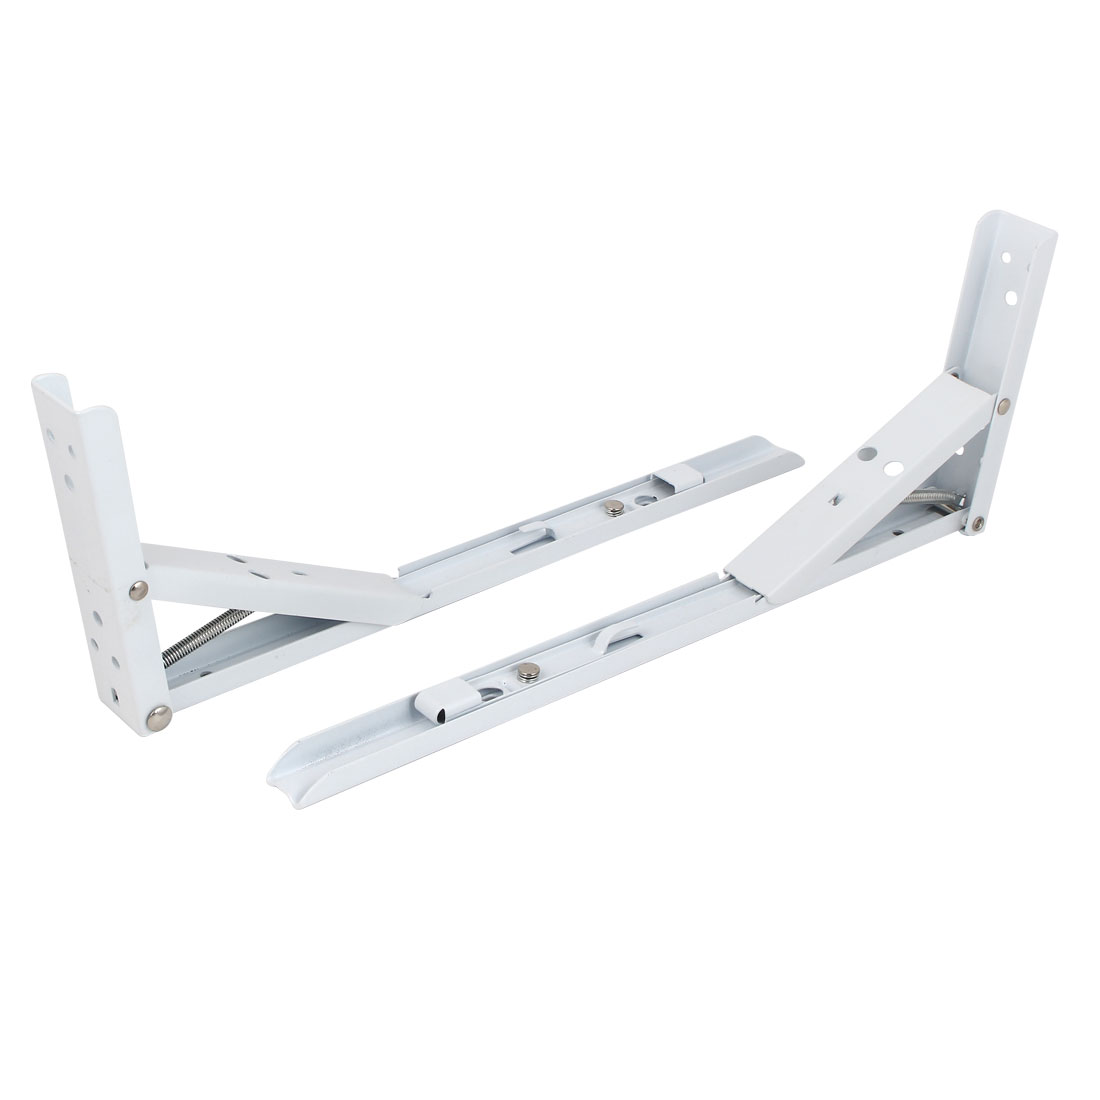 "2pcs 90 Degree Spring Loaded Folding Support Shelf Bracket 14"" Long"